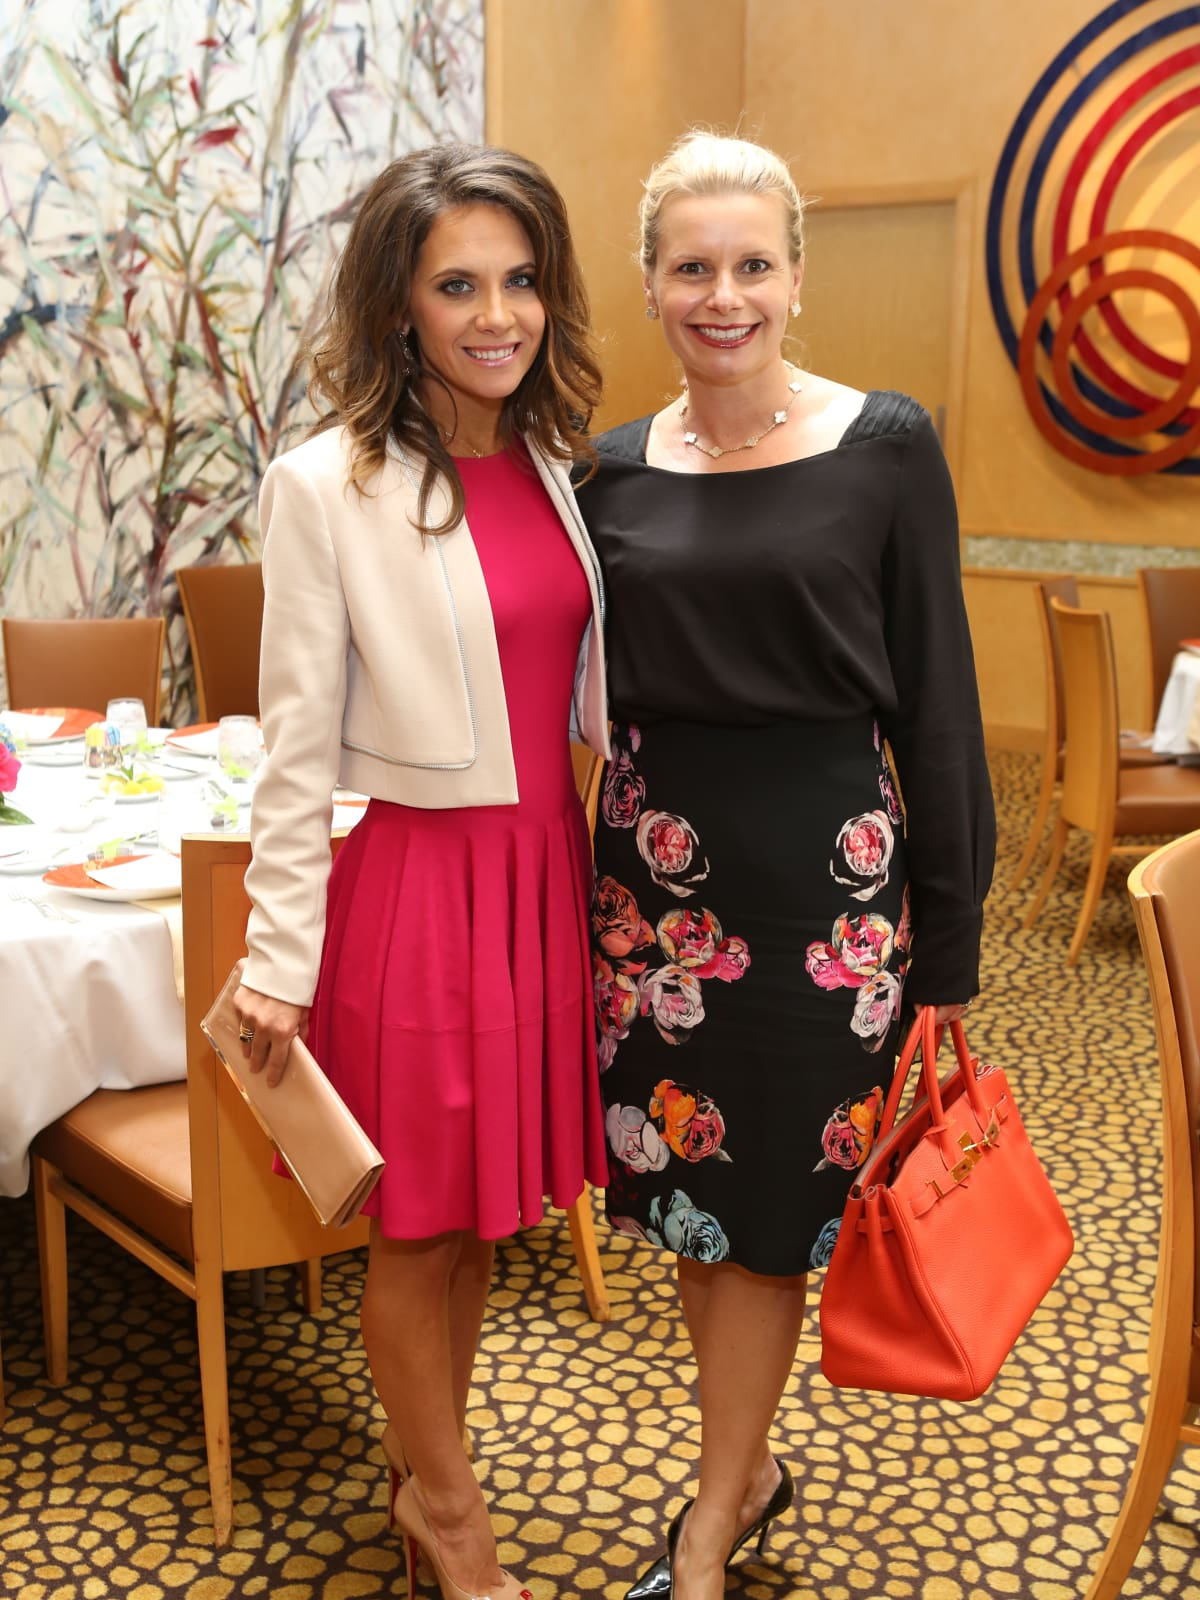 HGO Ball luncheon, March 2016, Joanna Marks, Valerie Dieterich